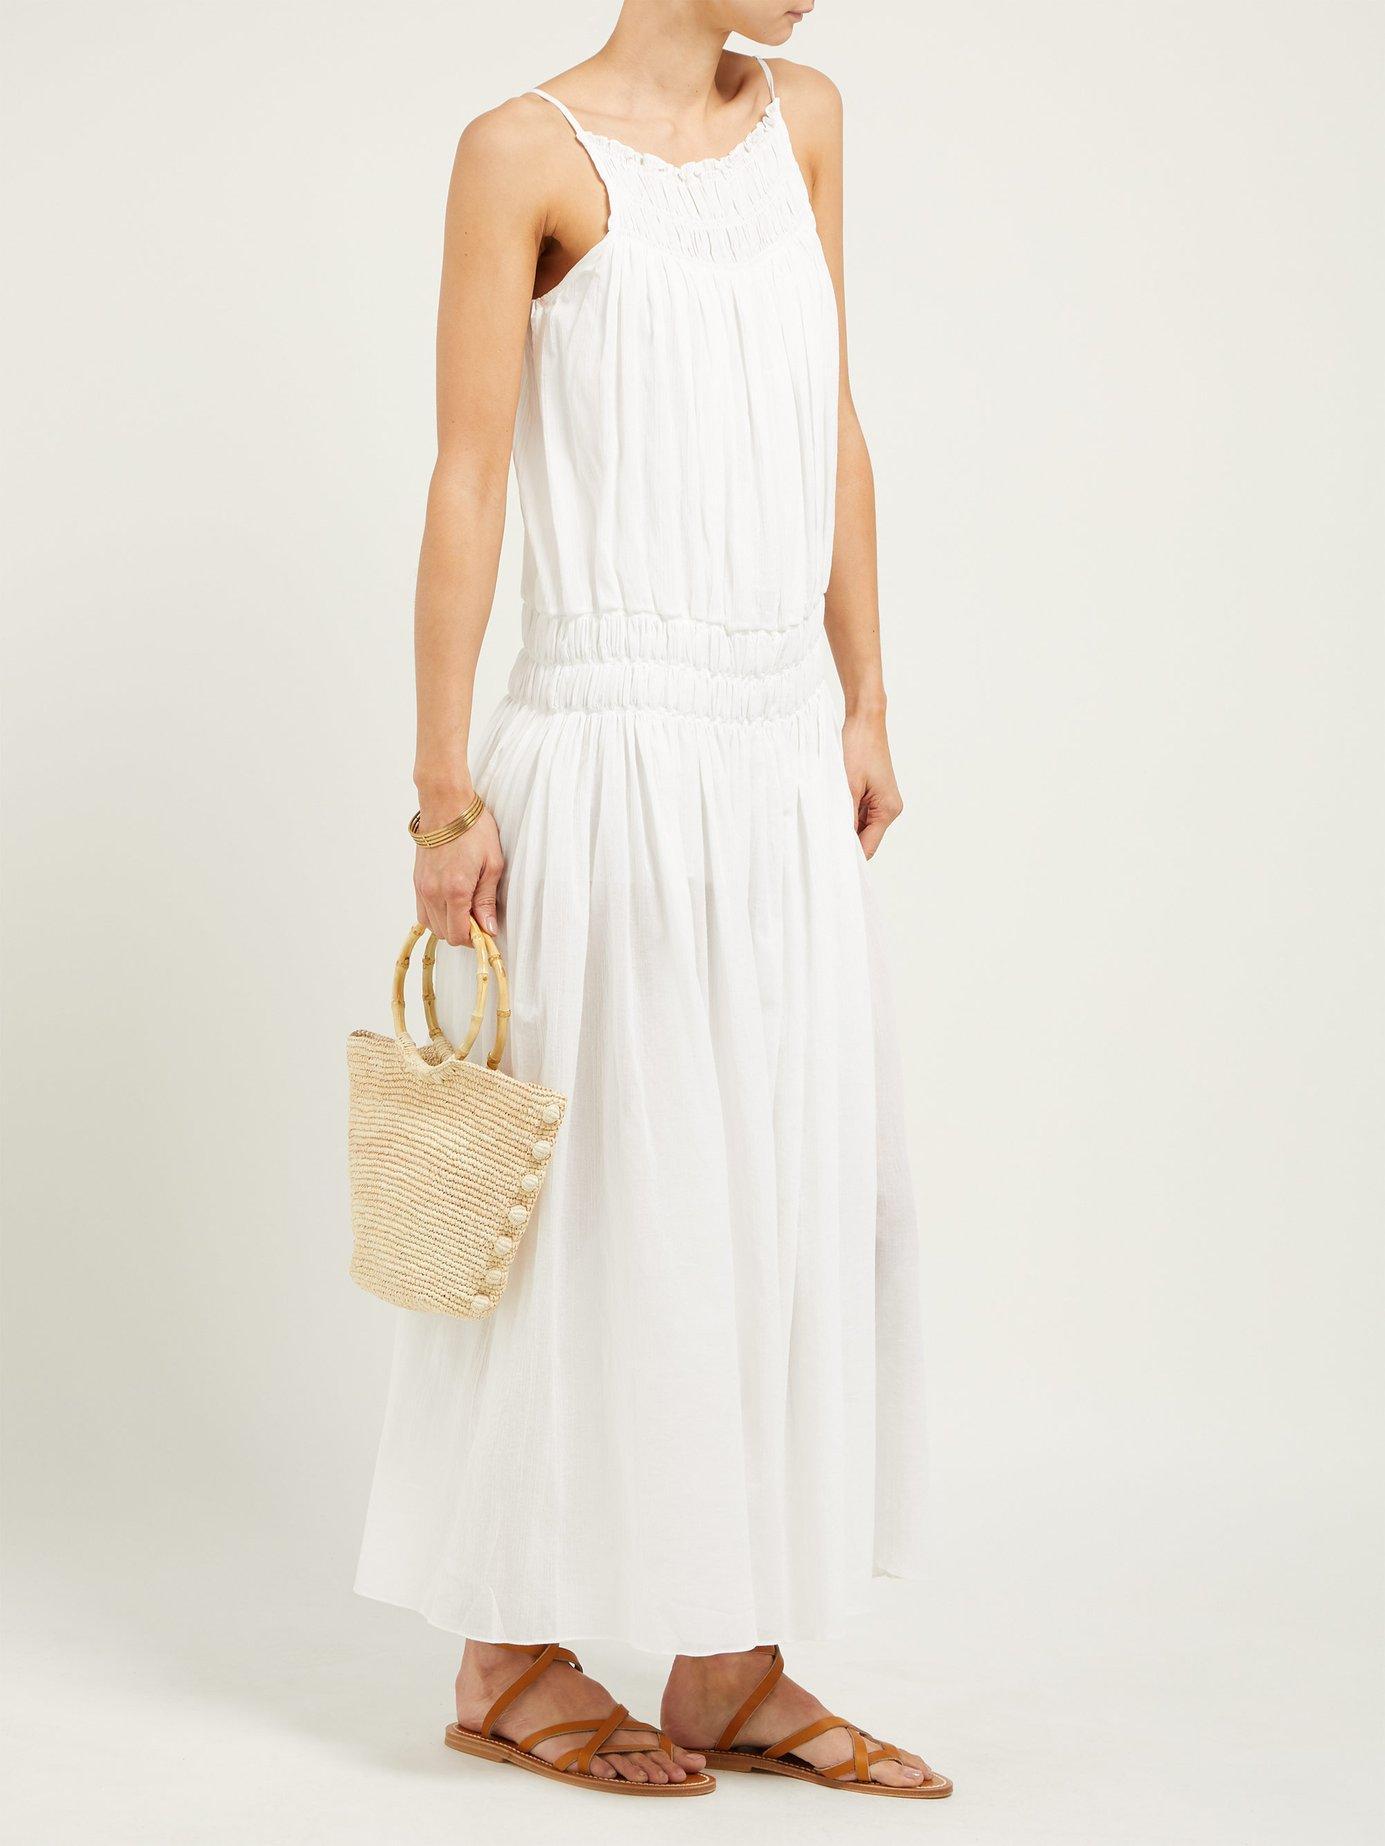 3d5cbb7adad Lyst - Three Graces London Gisella Dropped Waist Cotton Maxi Dress in White